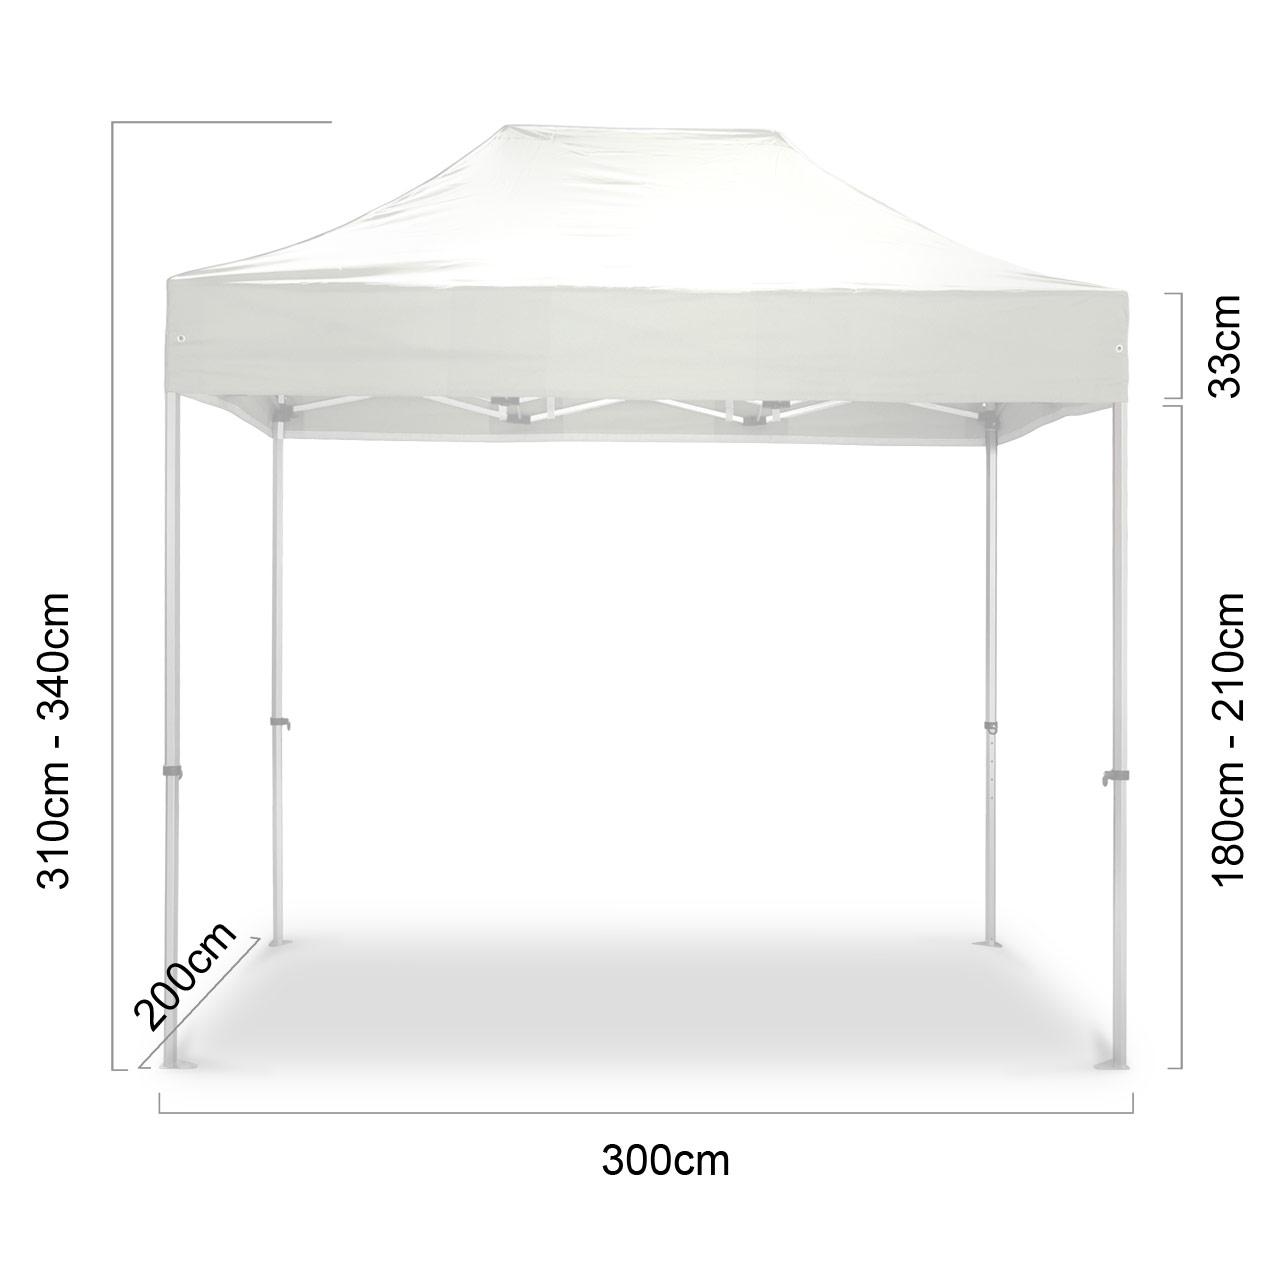 Faltpavillon-2x3-Abmessung58da54c6948dc